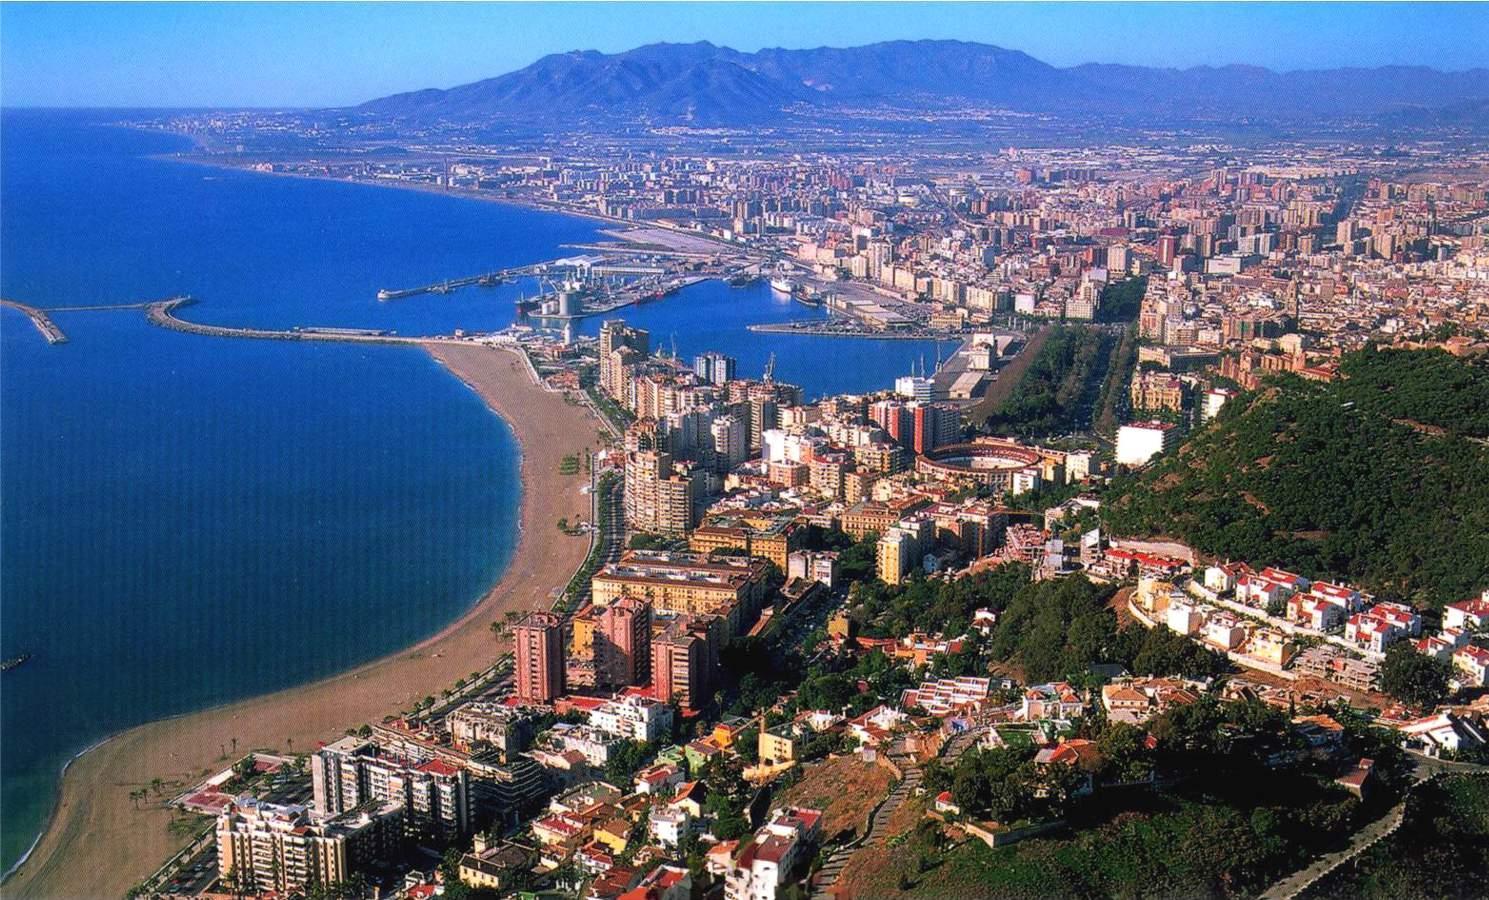 Malaga31